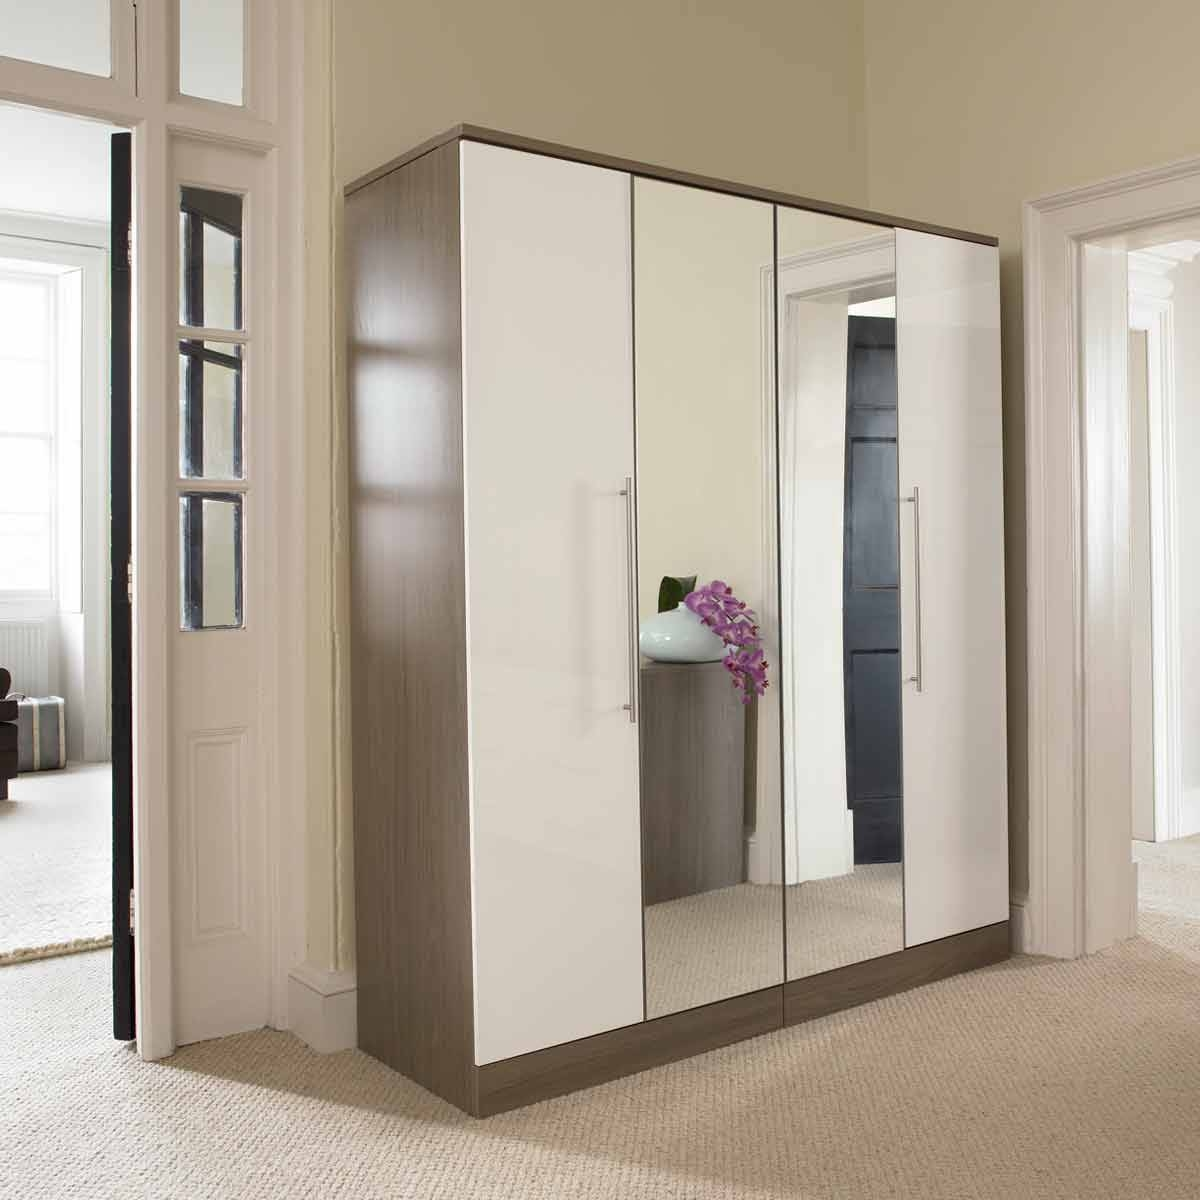 Sofa Wardrobe Closet With Mirror Doors Mirrored | Winafrica pertaining to 4 Door Mirrored Wardrobes (Image 15 of 15)